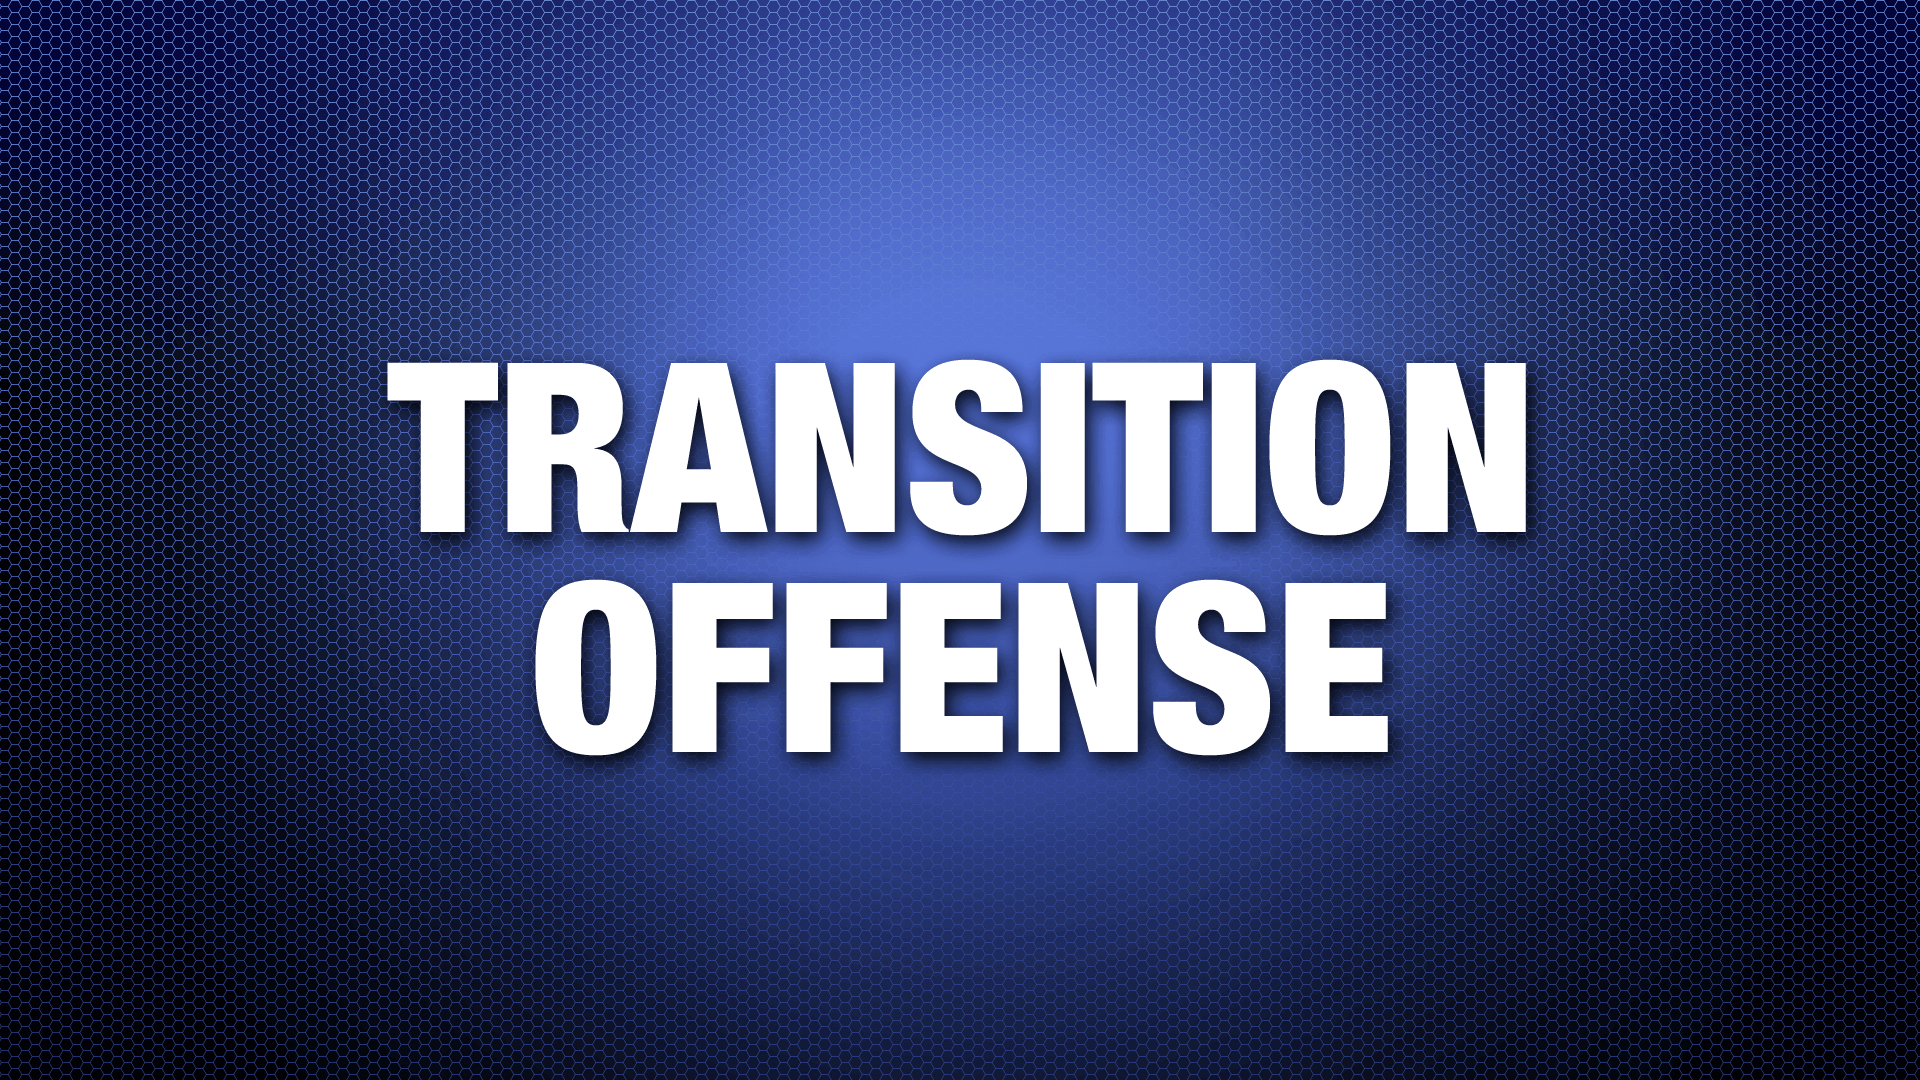 TransitionOffense